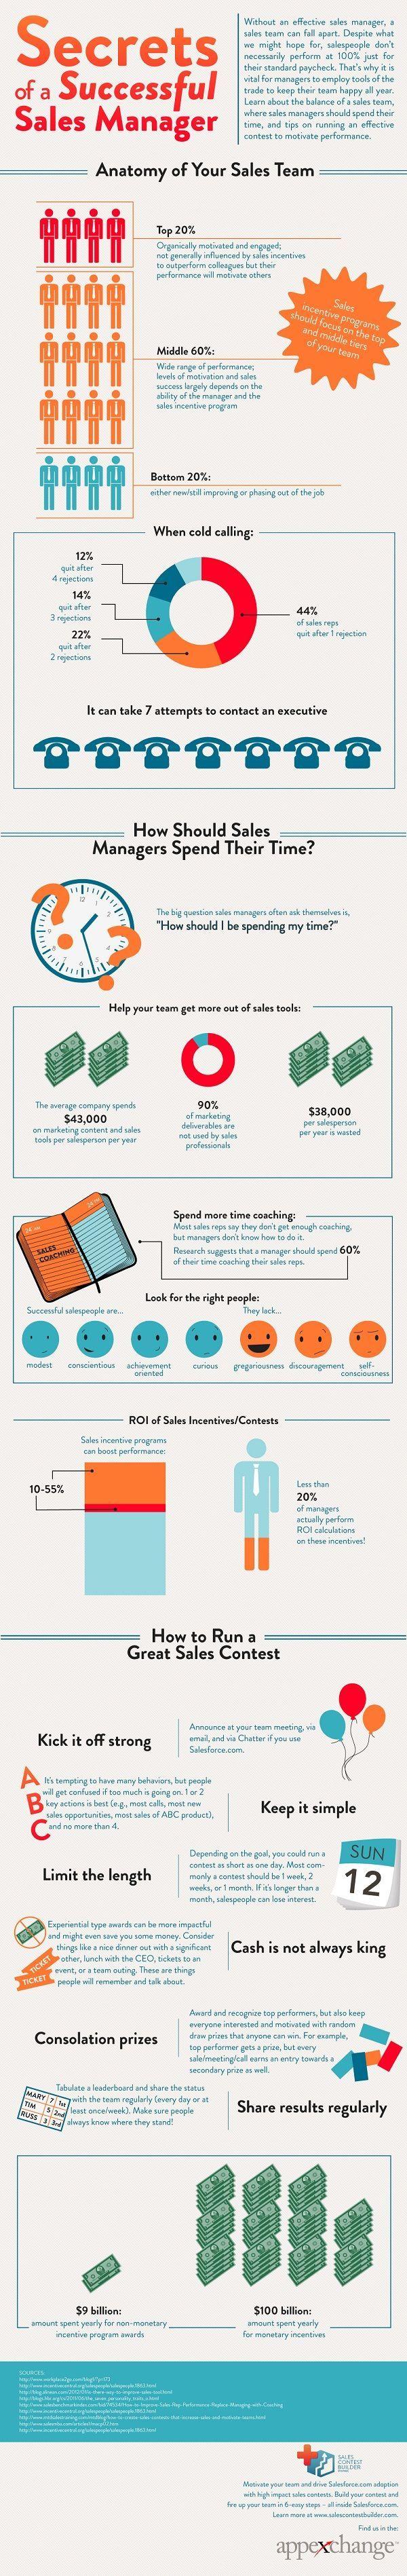 Best 25+ Sales presentation ideas on Pinterest ...